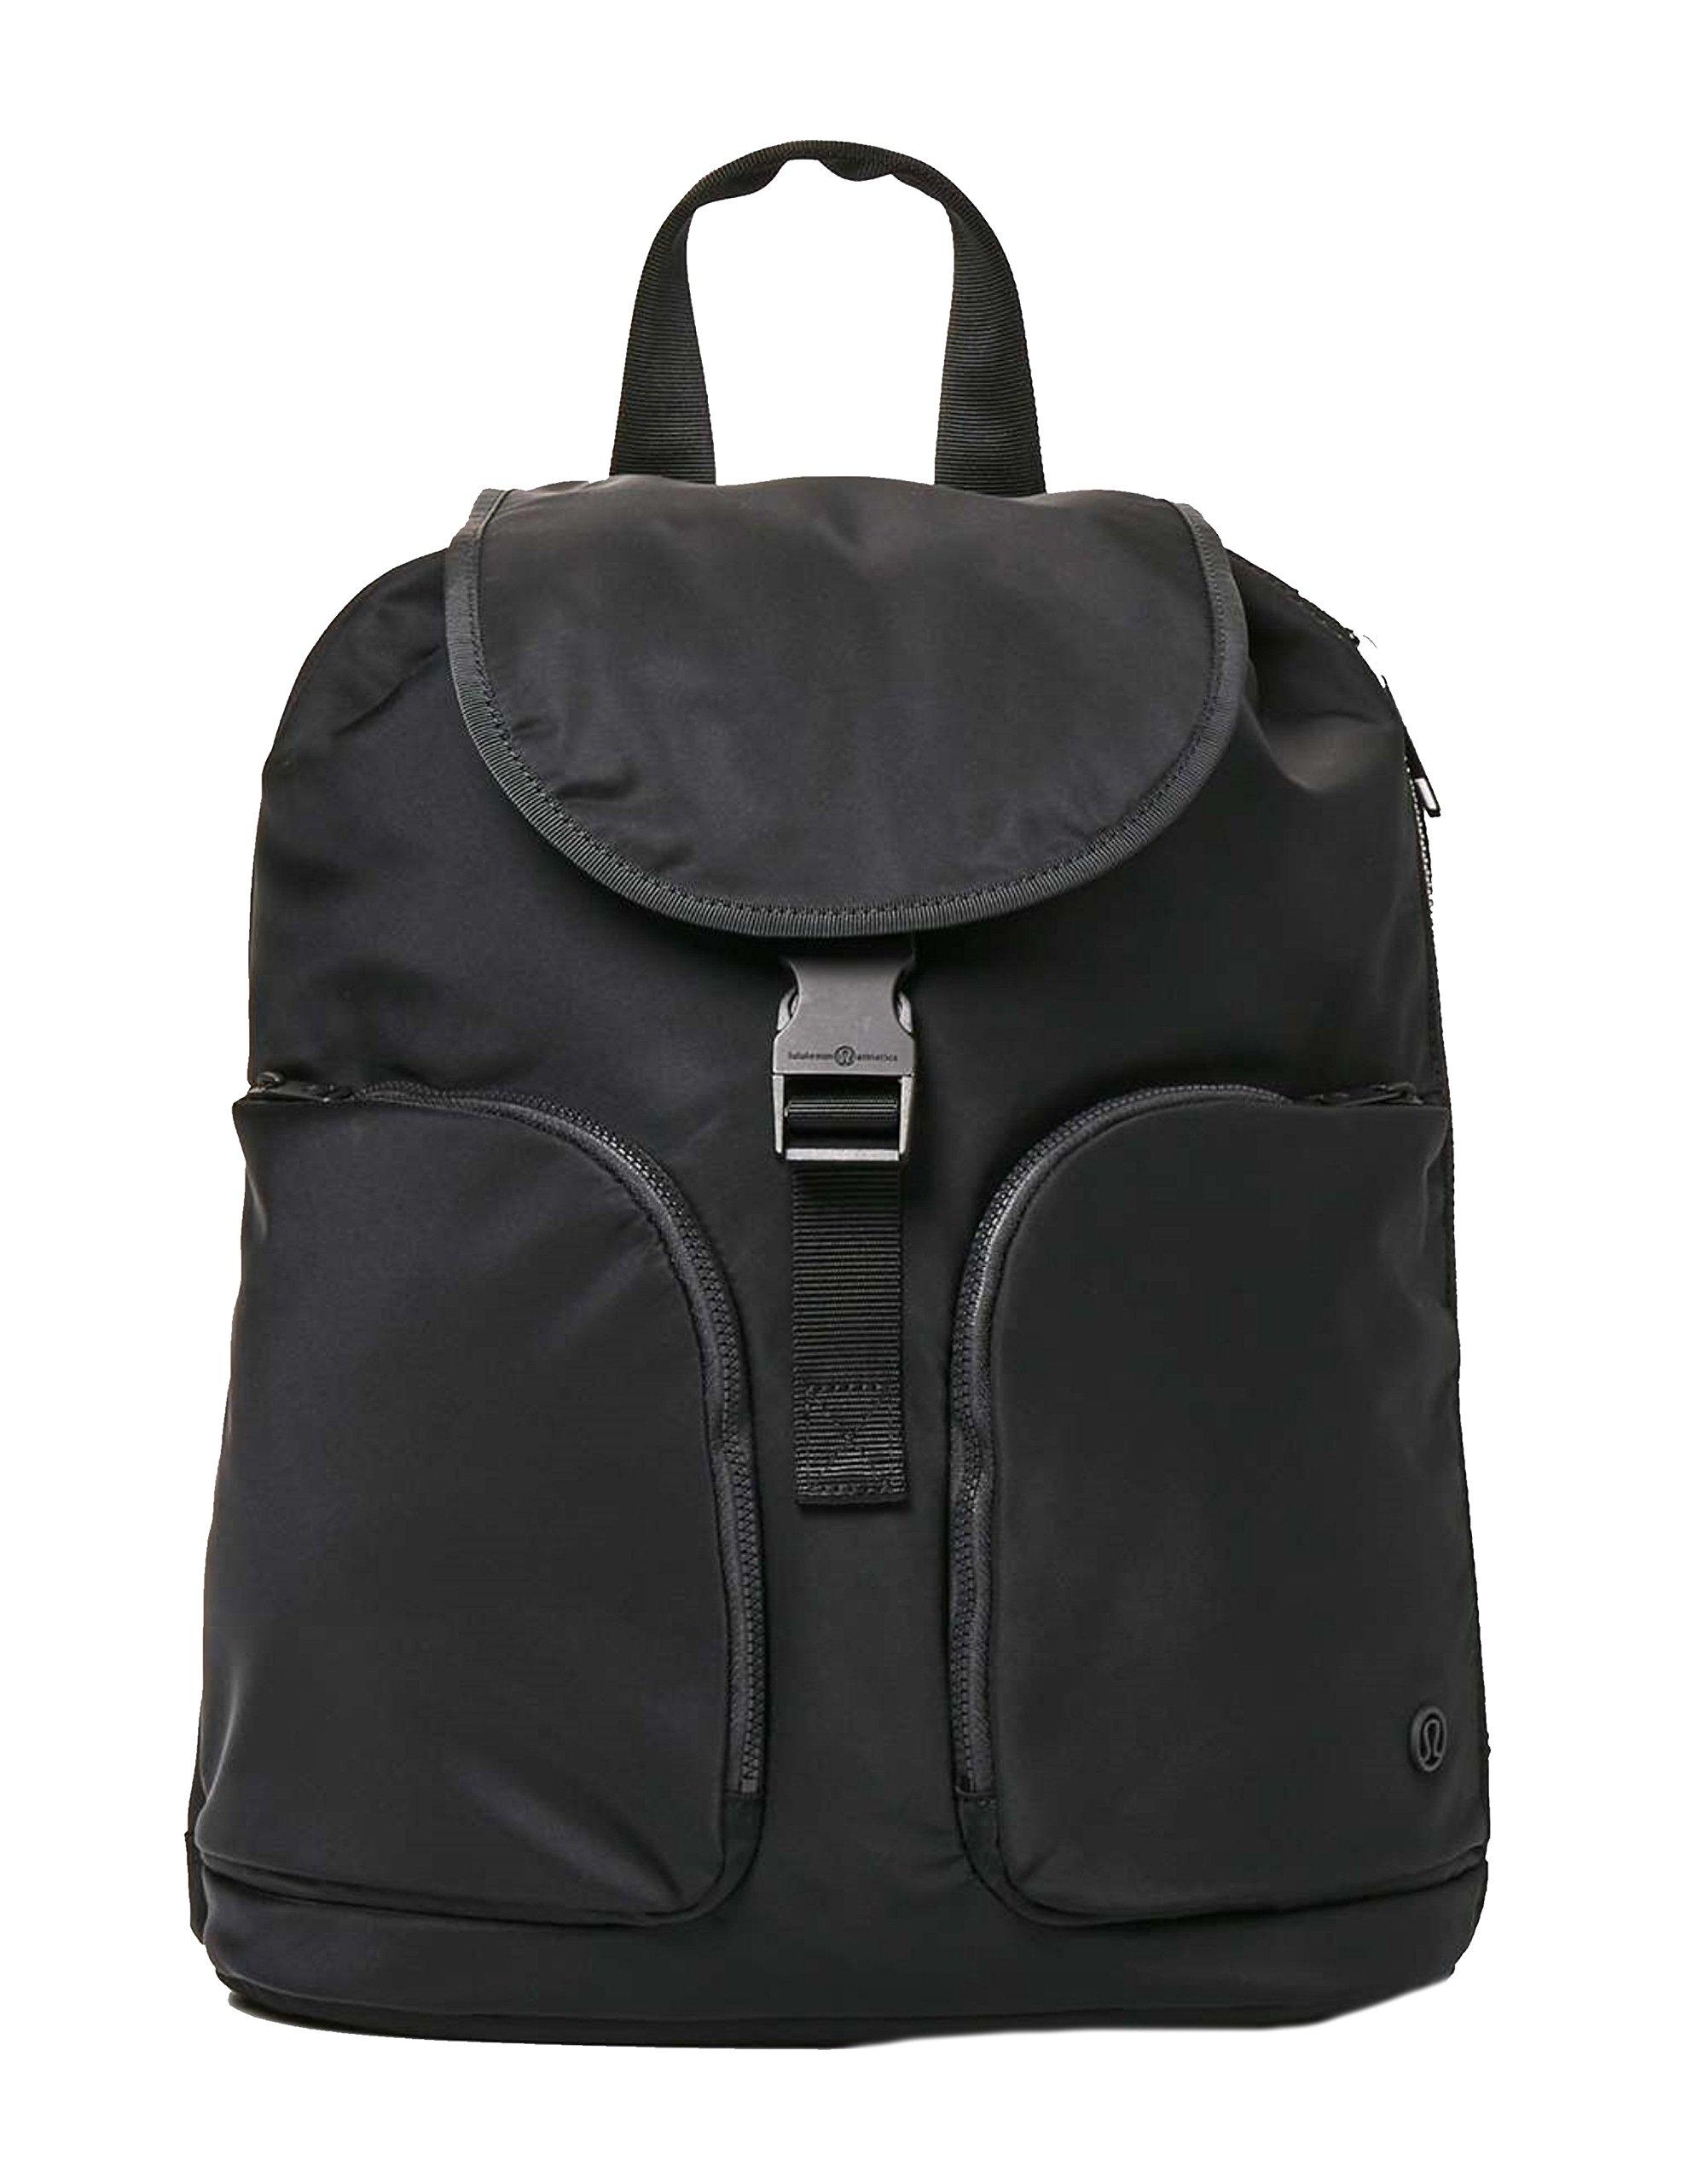 Lululemon Carry Onward Rucksack12L Black